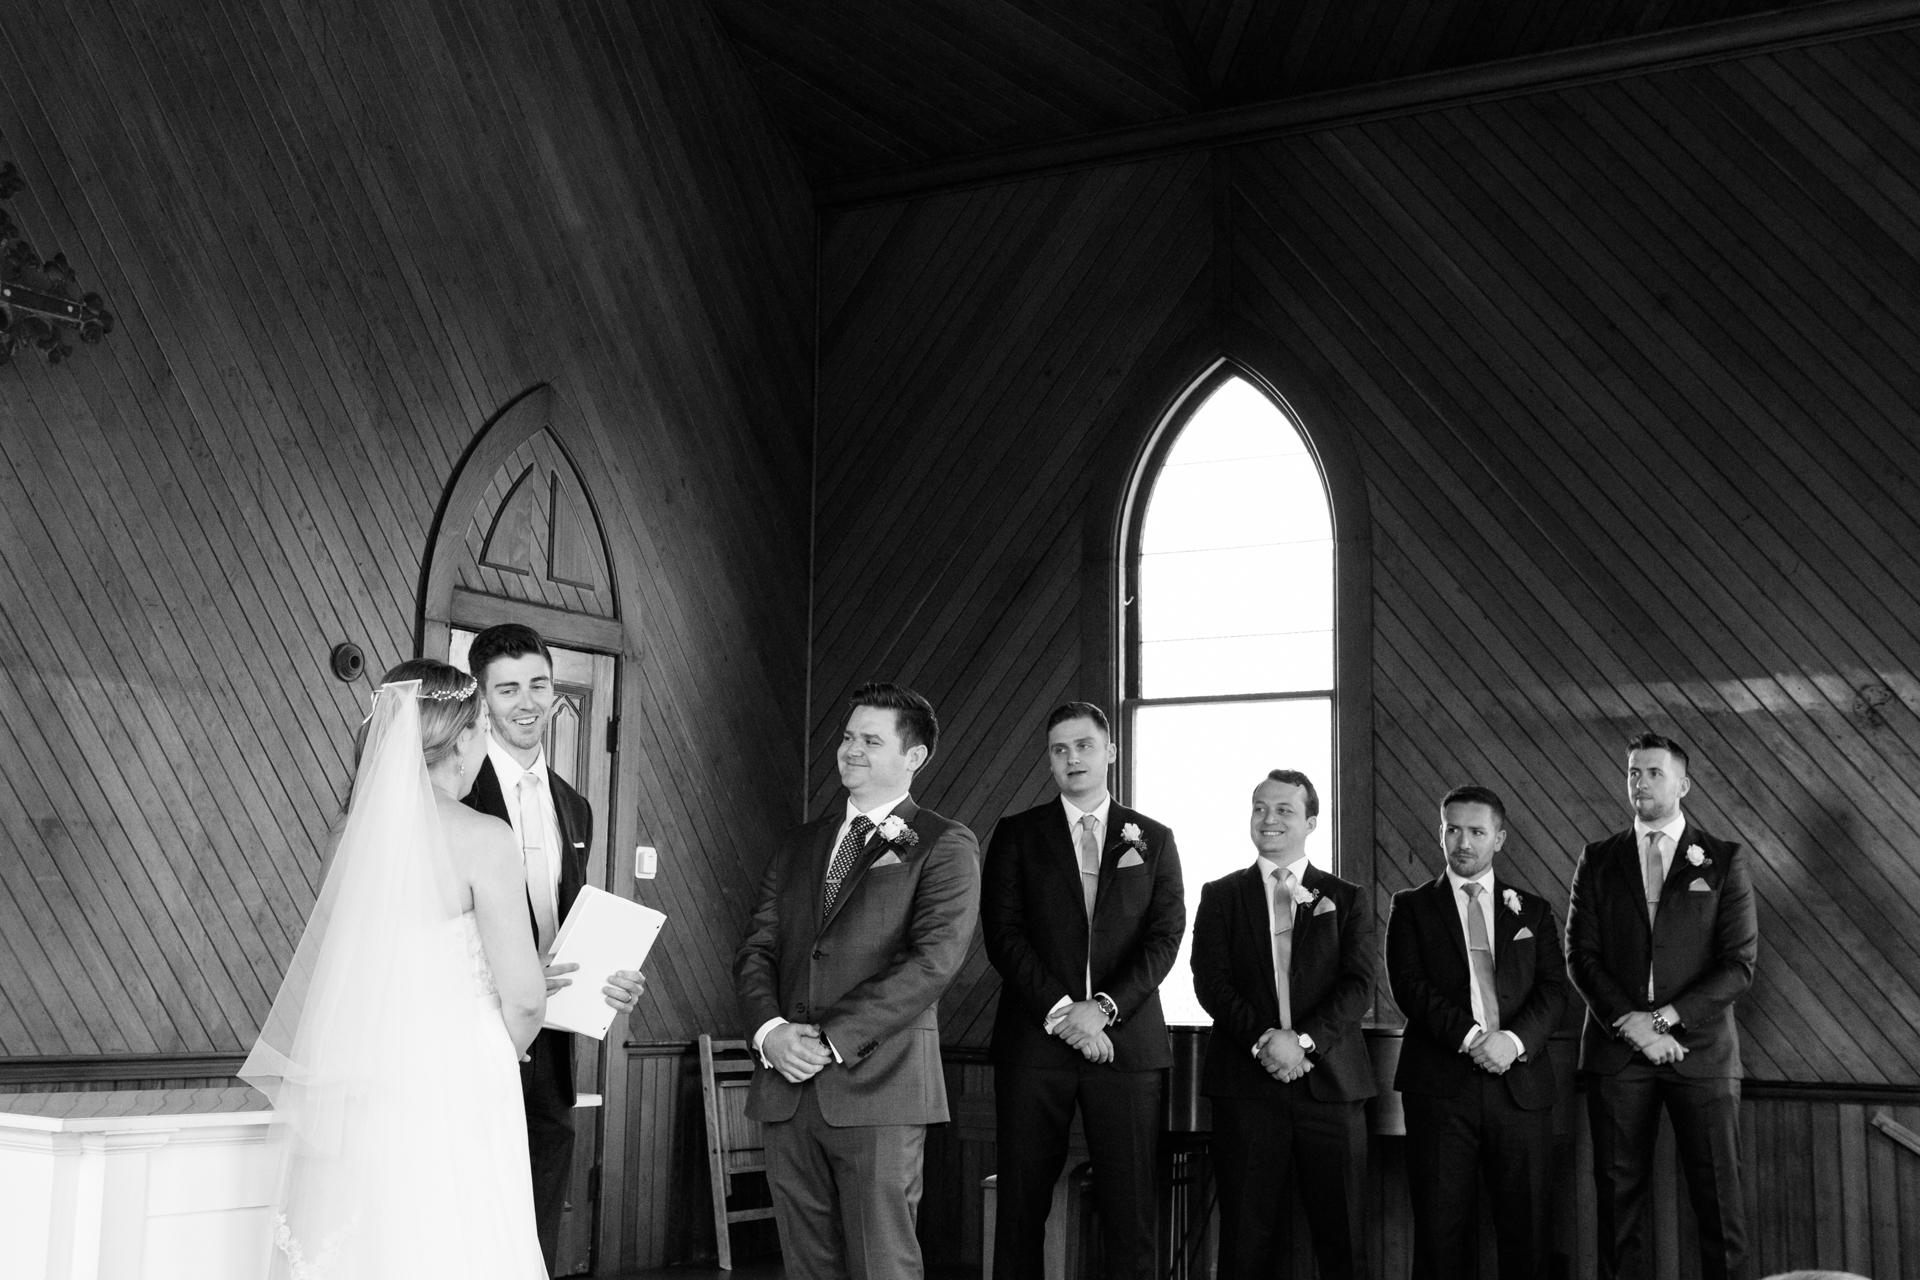 KBWeddings_MeaghanMark_WeddingPreview_B4_8803.jpg